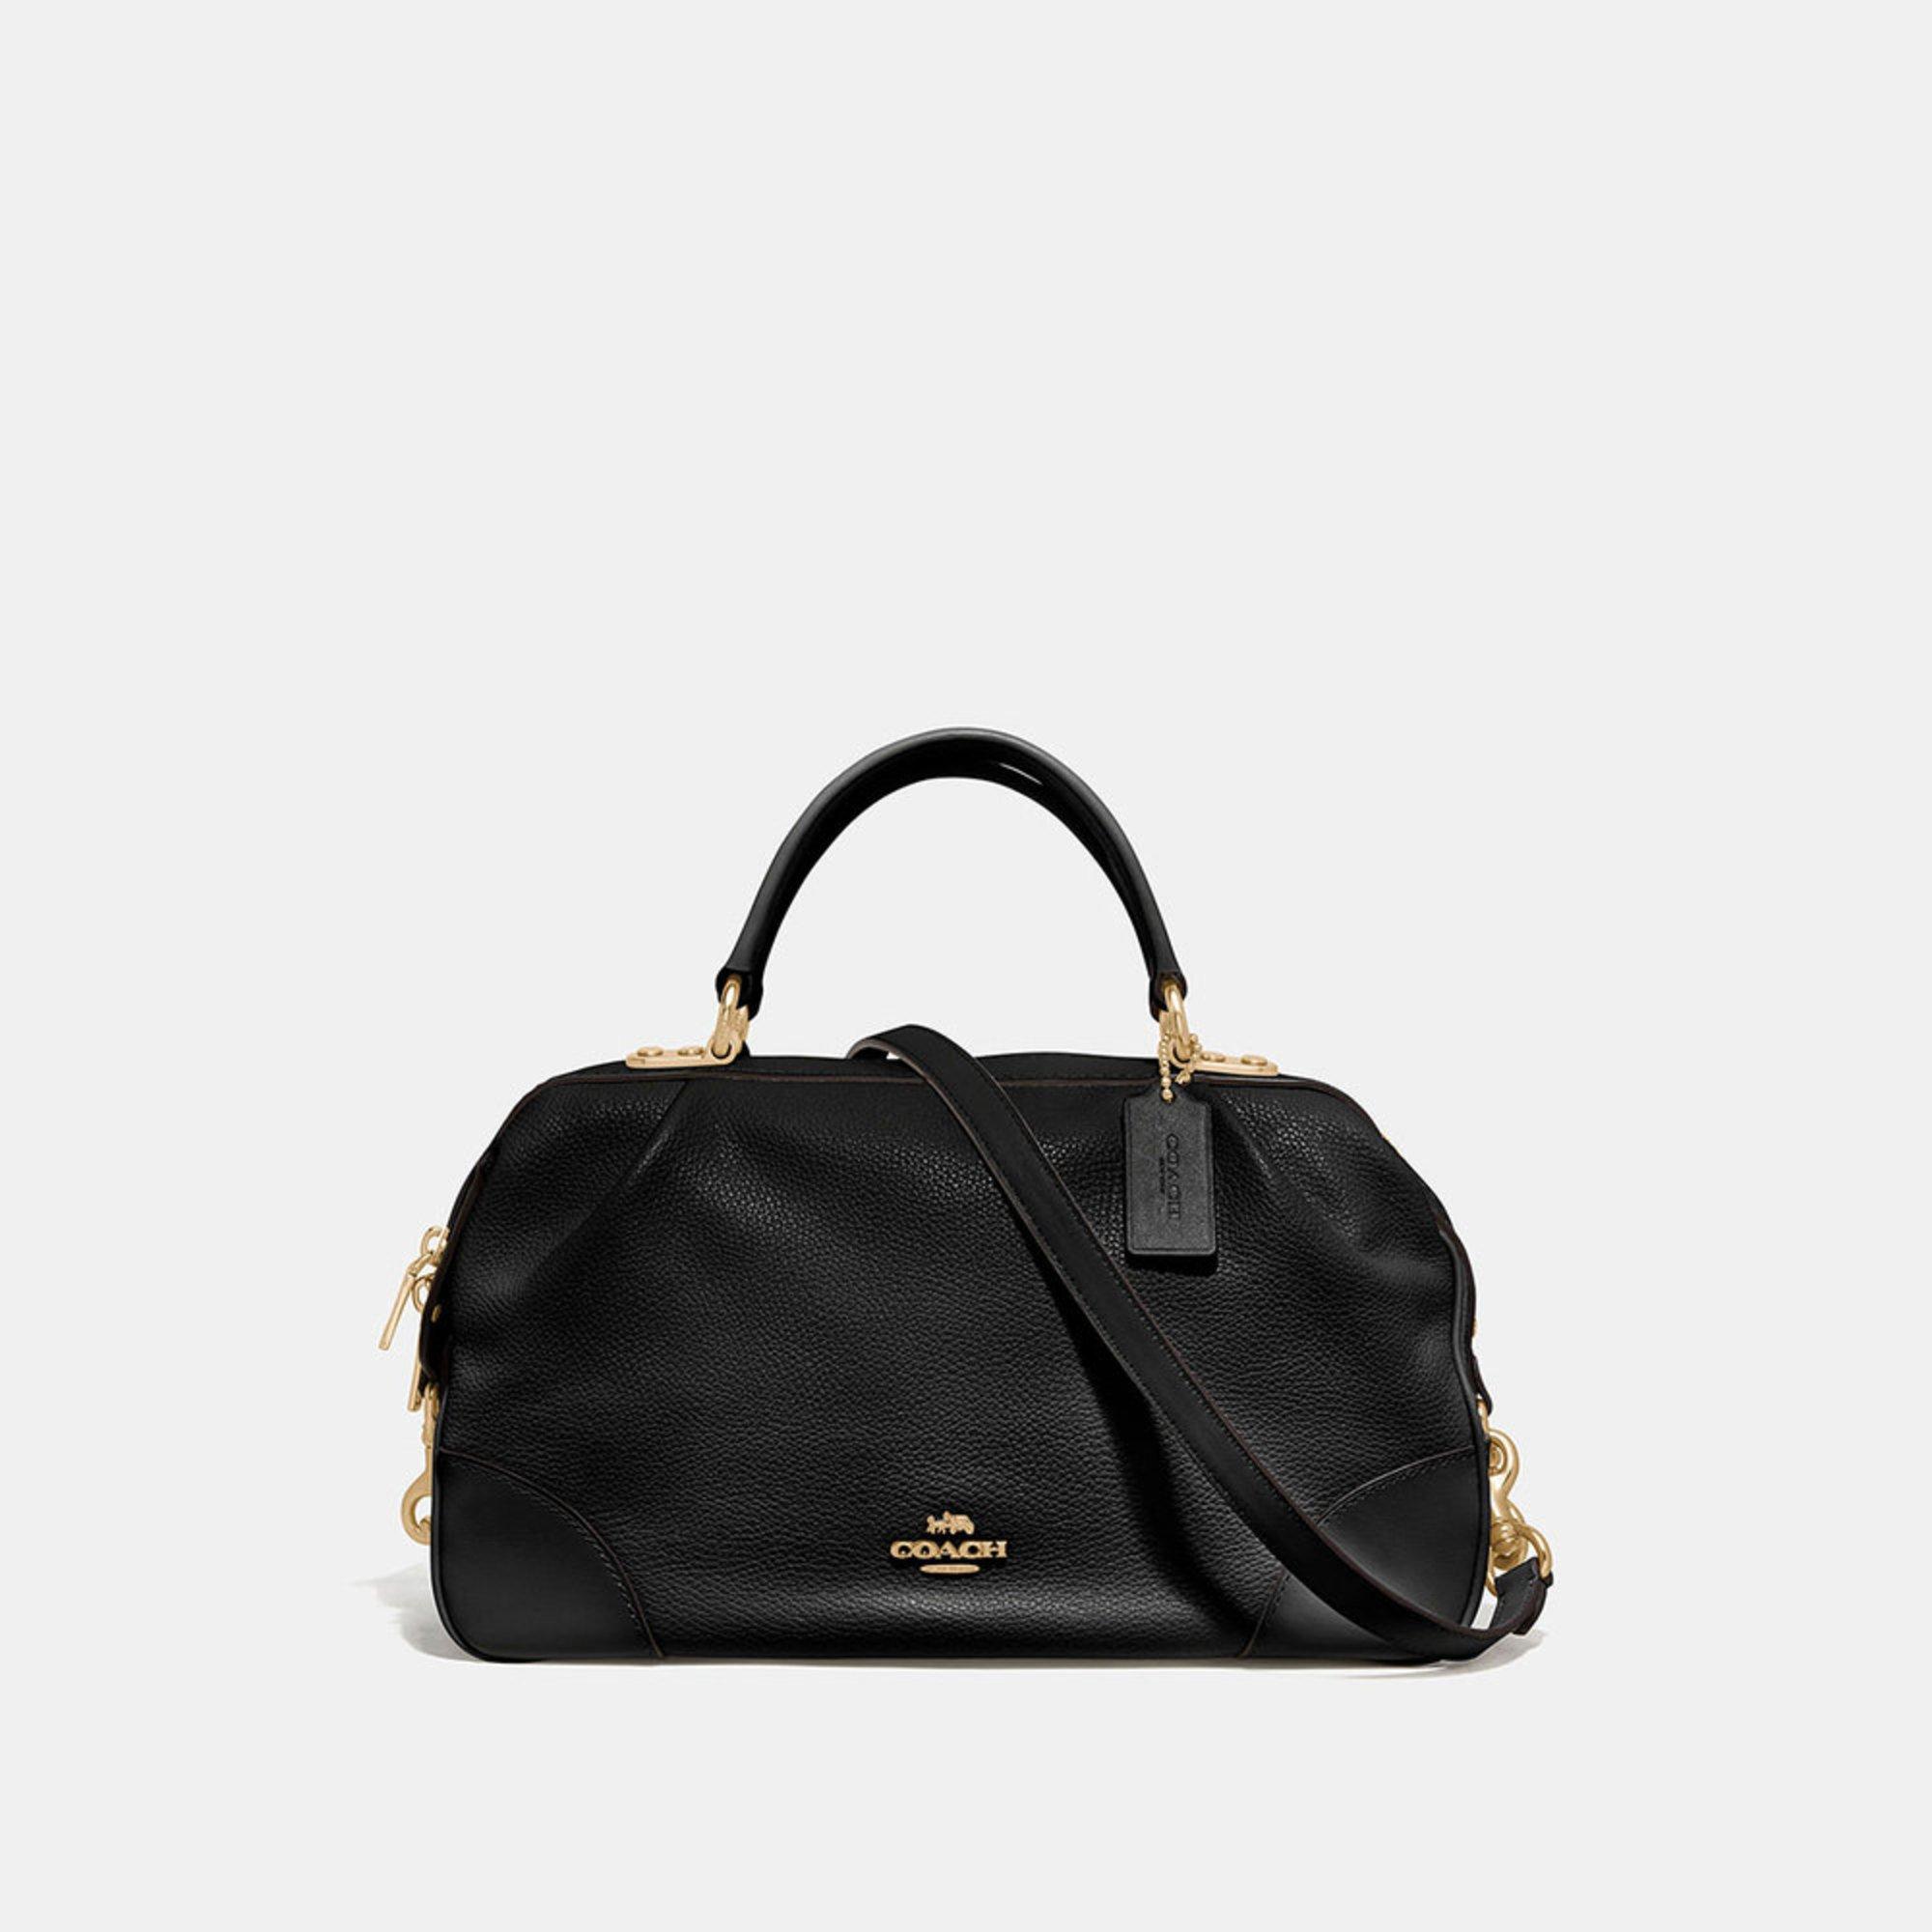 6a995411cb5f Coach Polished Pebble Leather Lane Satchel | Satchels | Handbags ...